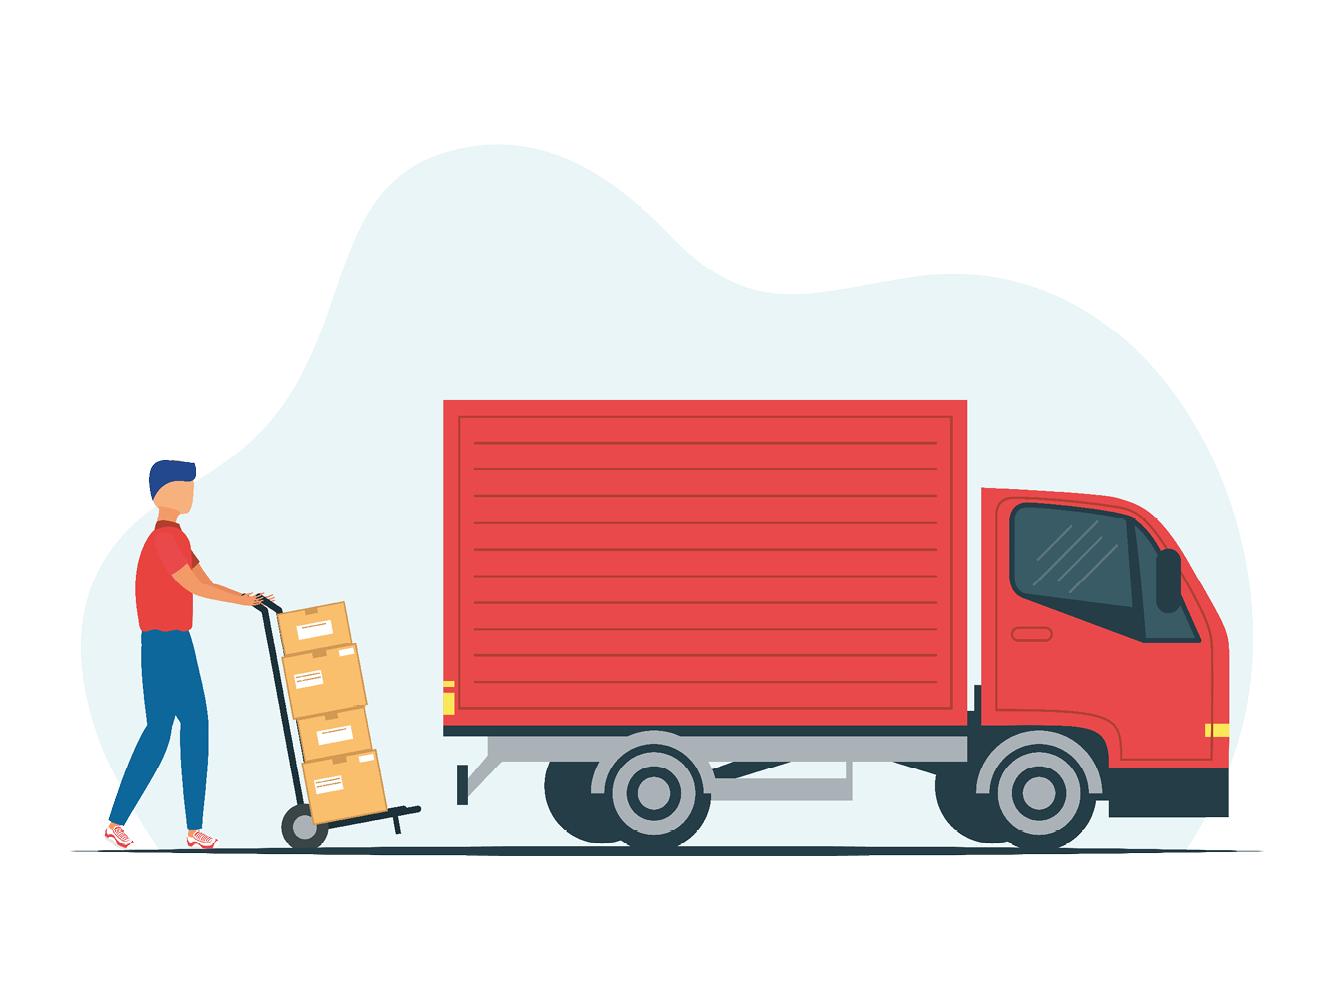 Logistics-truck-illustration